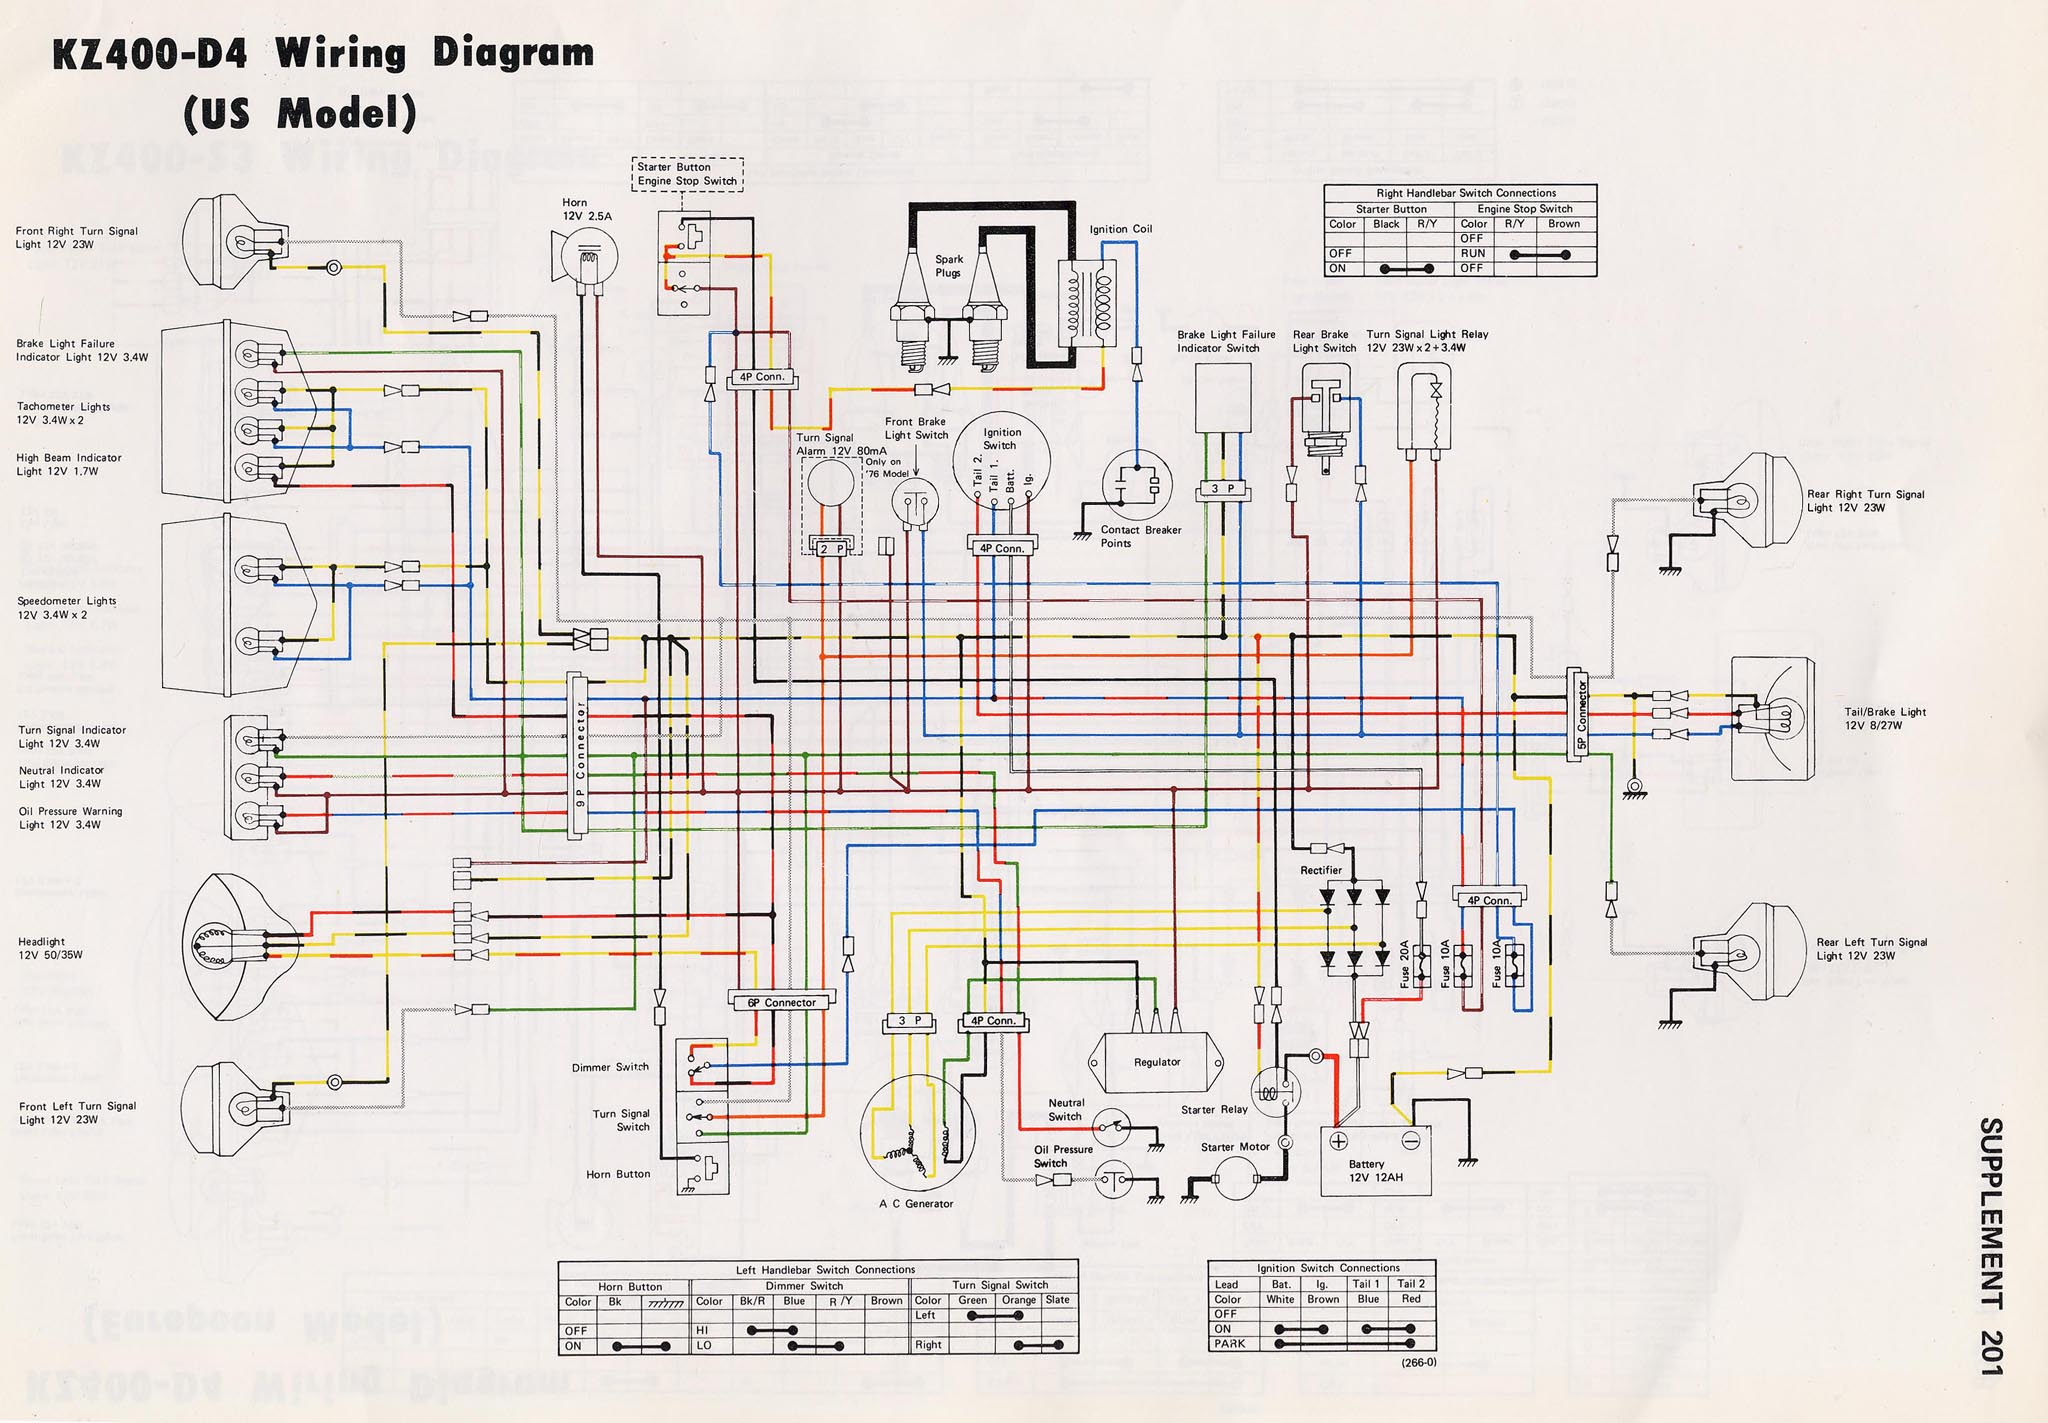 kawasaki klf220 wiring diagram sodium electron shell h1 diagrams best librarykz400 library snatch block k z 400